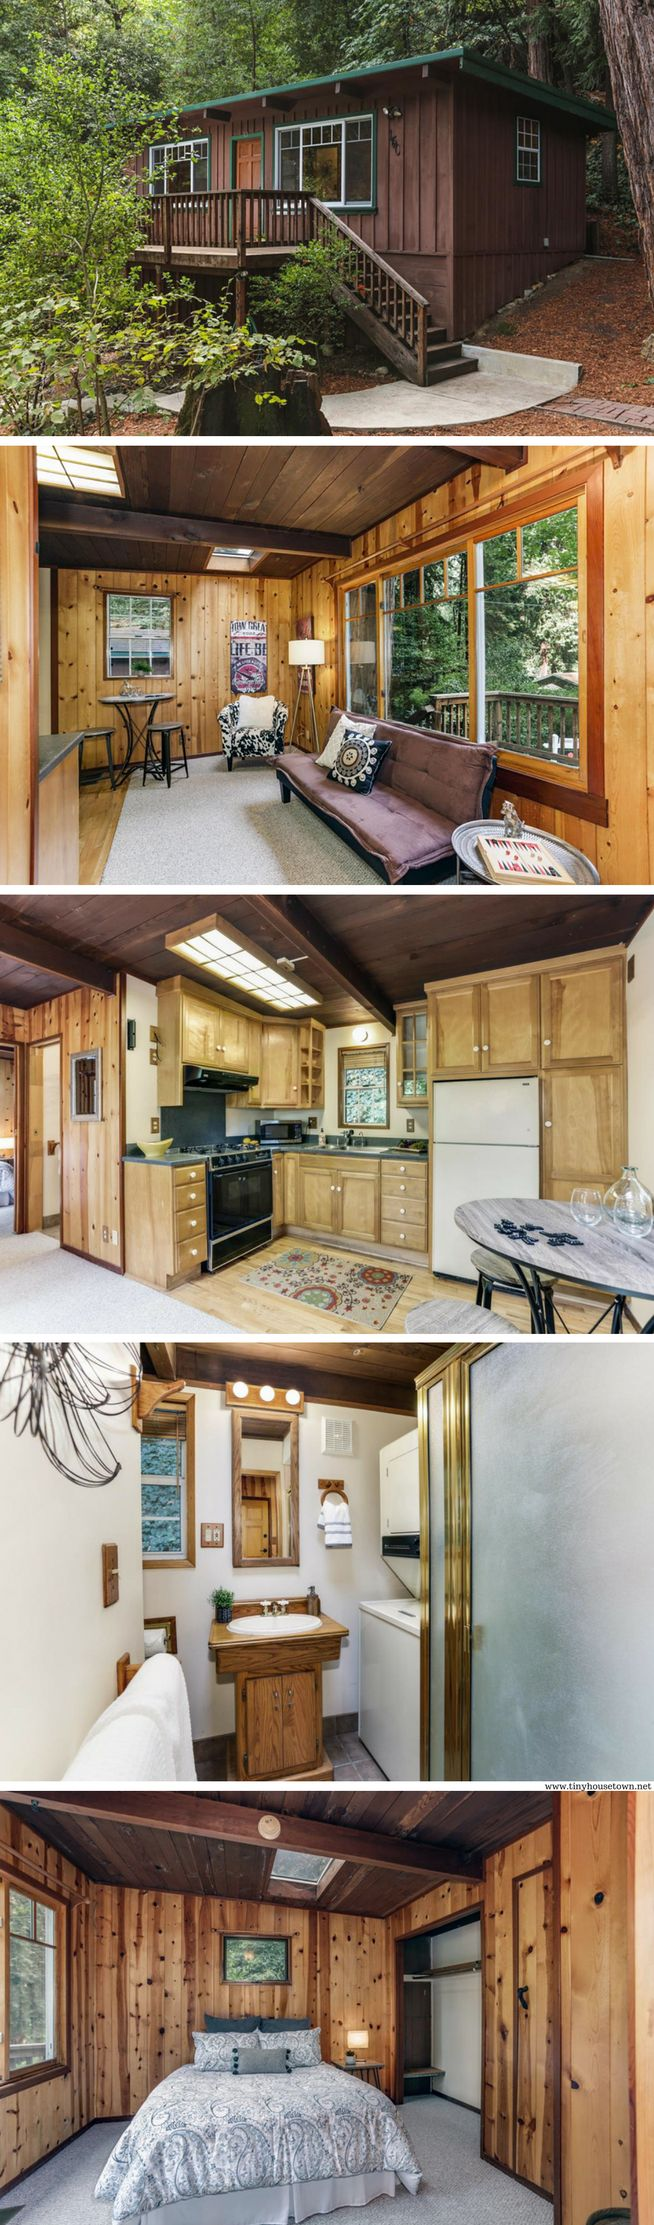 a 420 sq ft cabin in ben lomond california small house living rh pinterest com